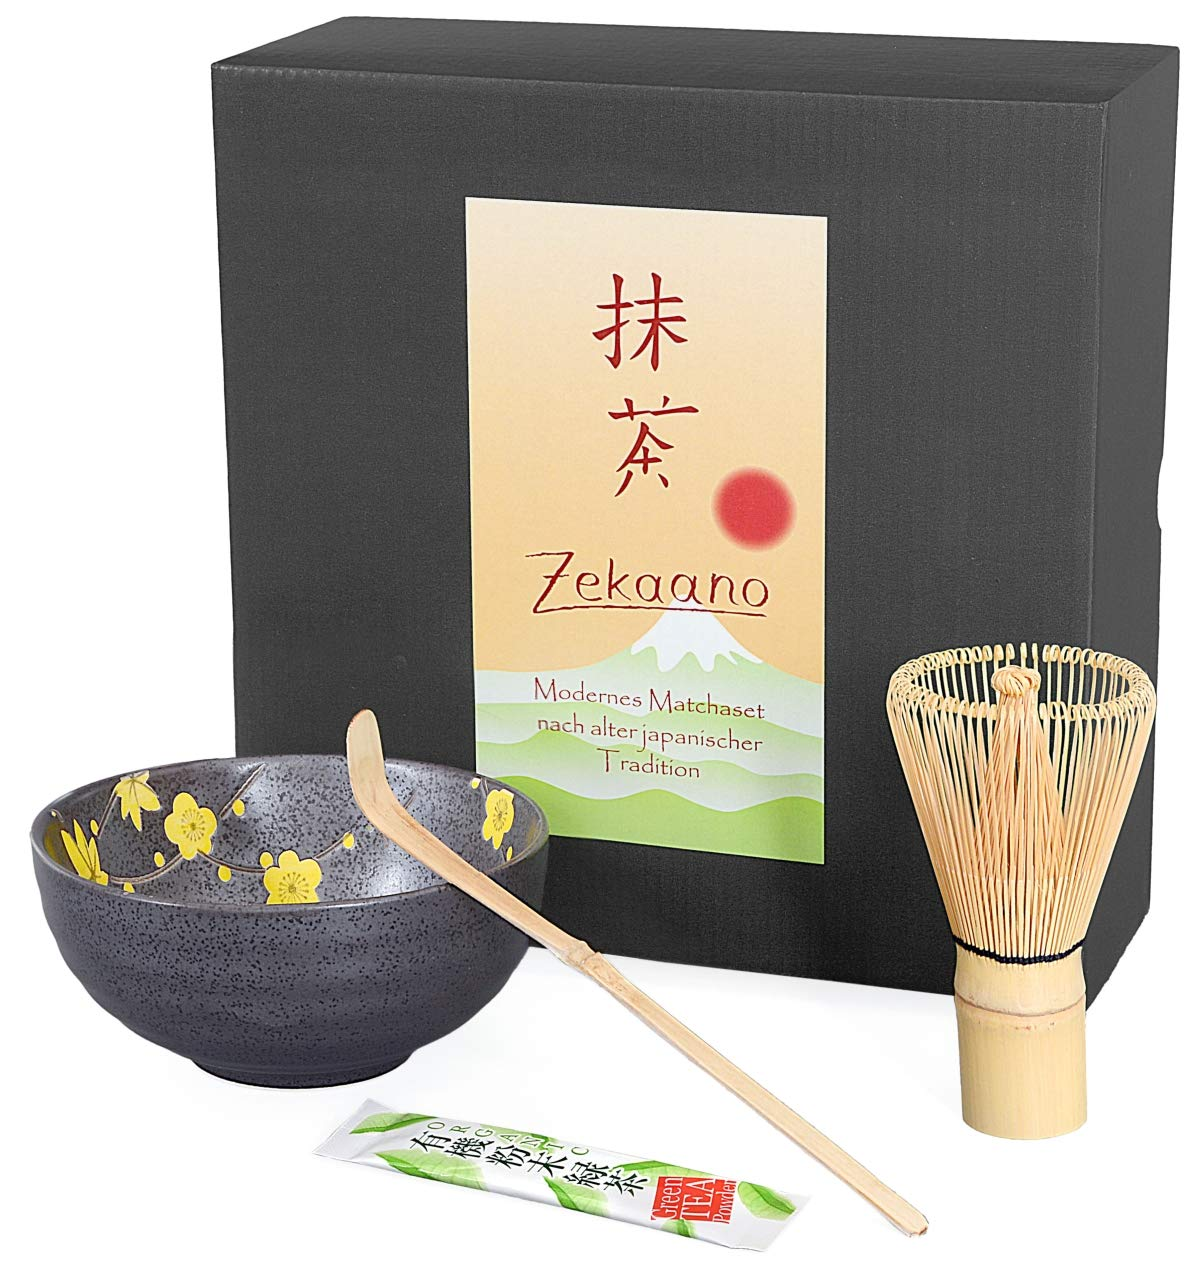 Matcha Set of 3, Grey Yellow, Includes Matcha Bowl, Matcha Spoon and Bamboo Matcha Whisk (Set in a Gift Box. Aricola®